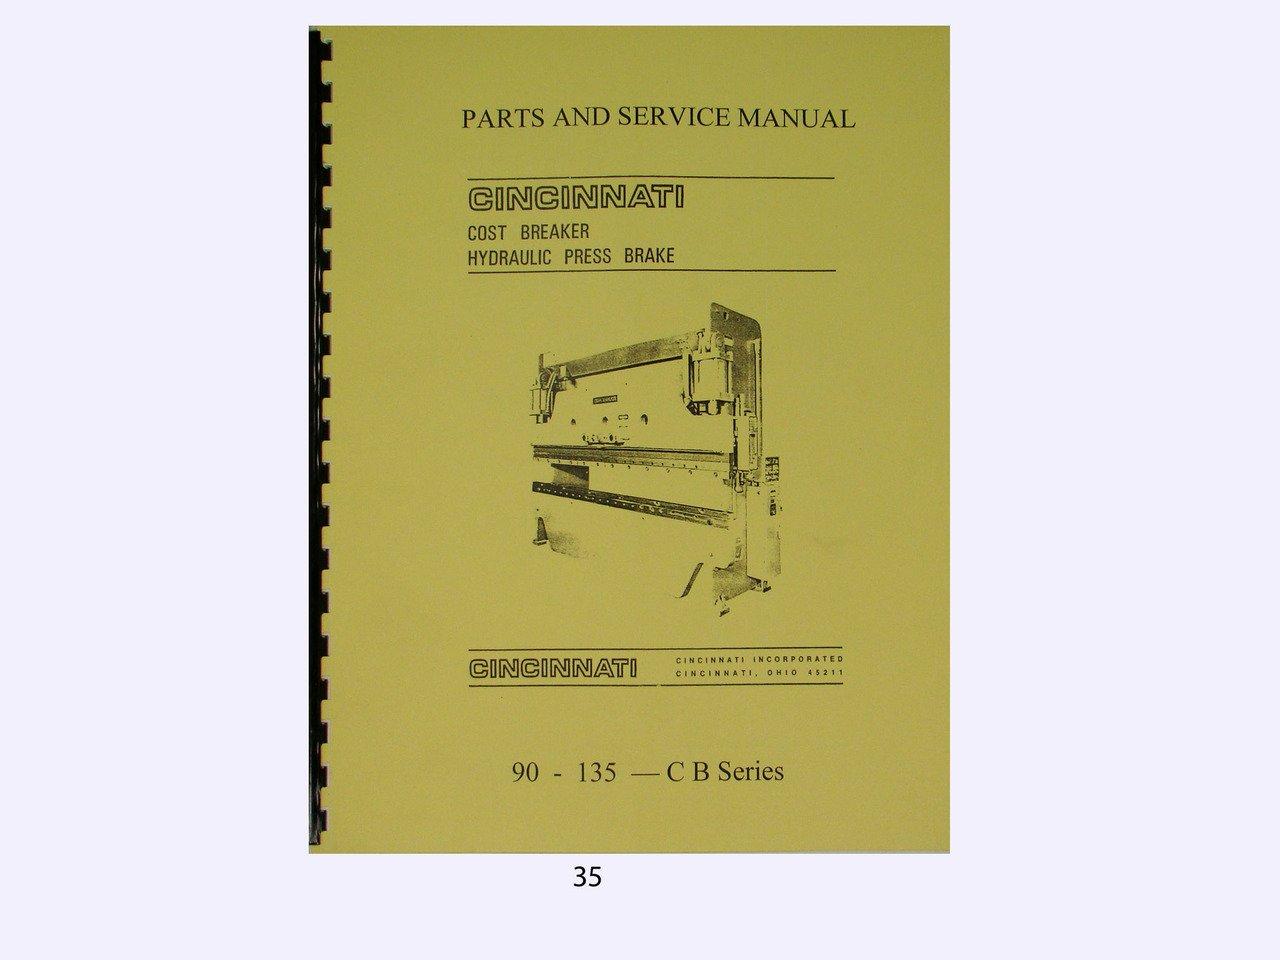 Cincinnati Cost Breaker Hydraulic Press Brake 90-135CB Series Manual